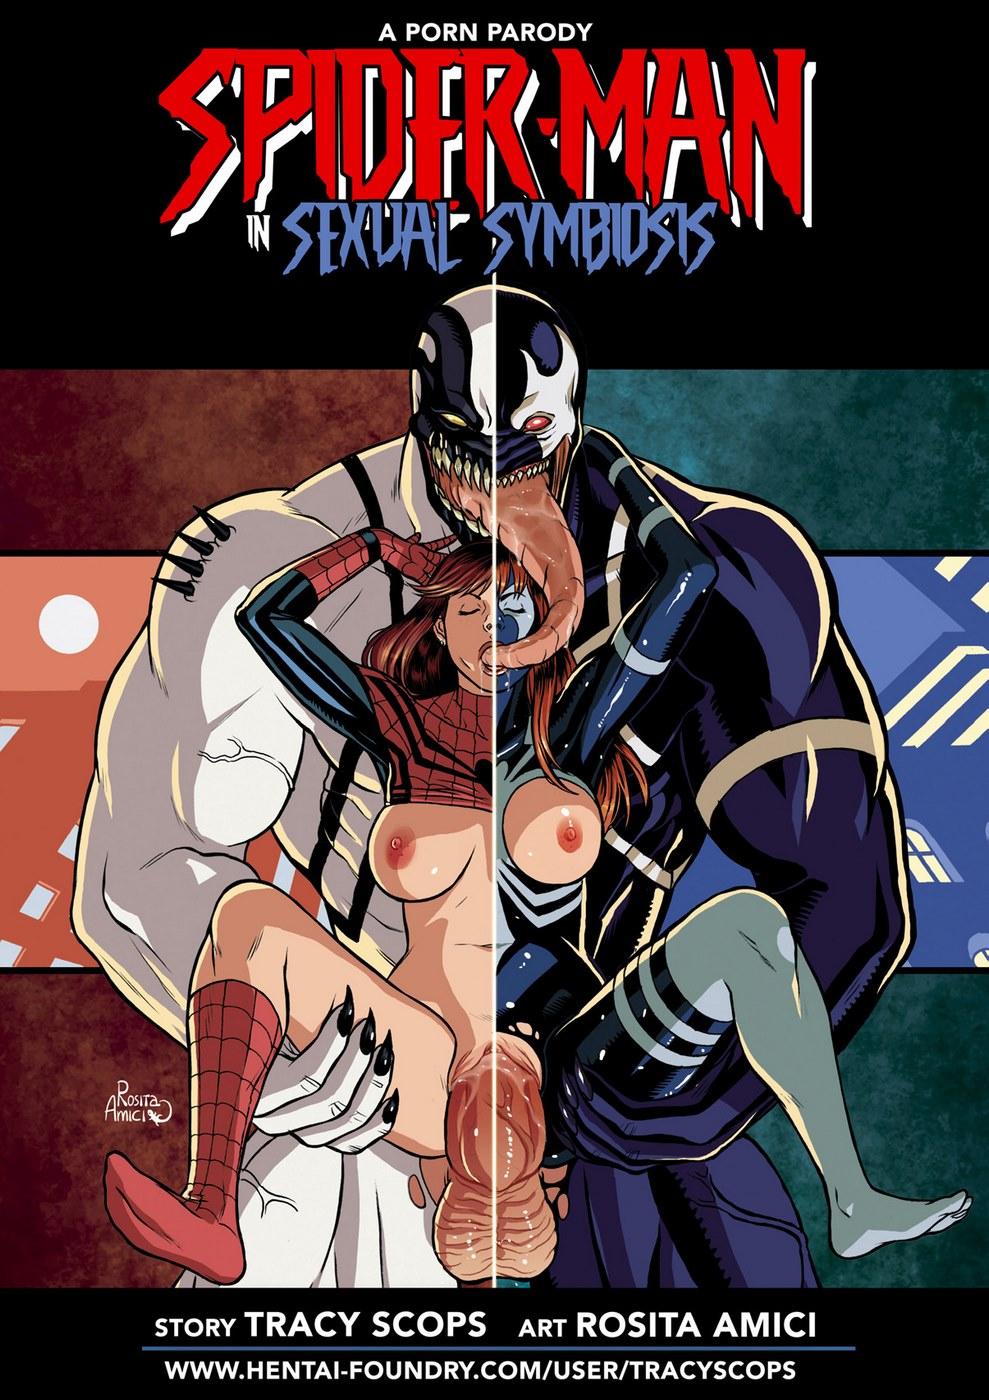 Spider-Man Sexual Symbiosis 1 porn comics 8 muses